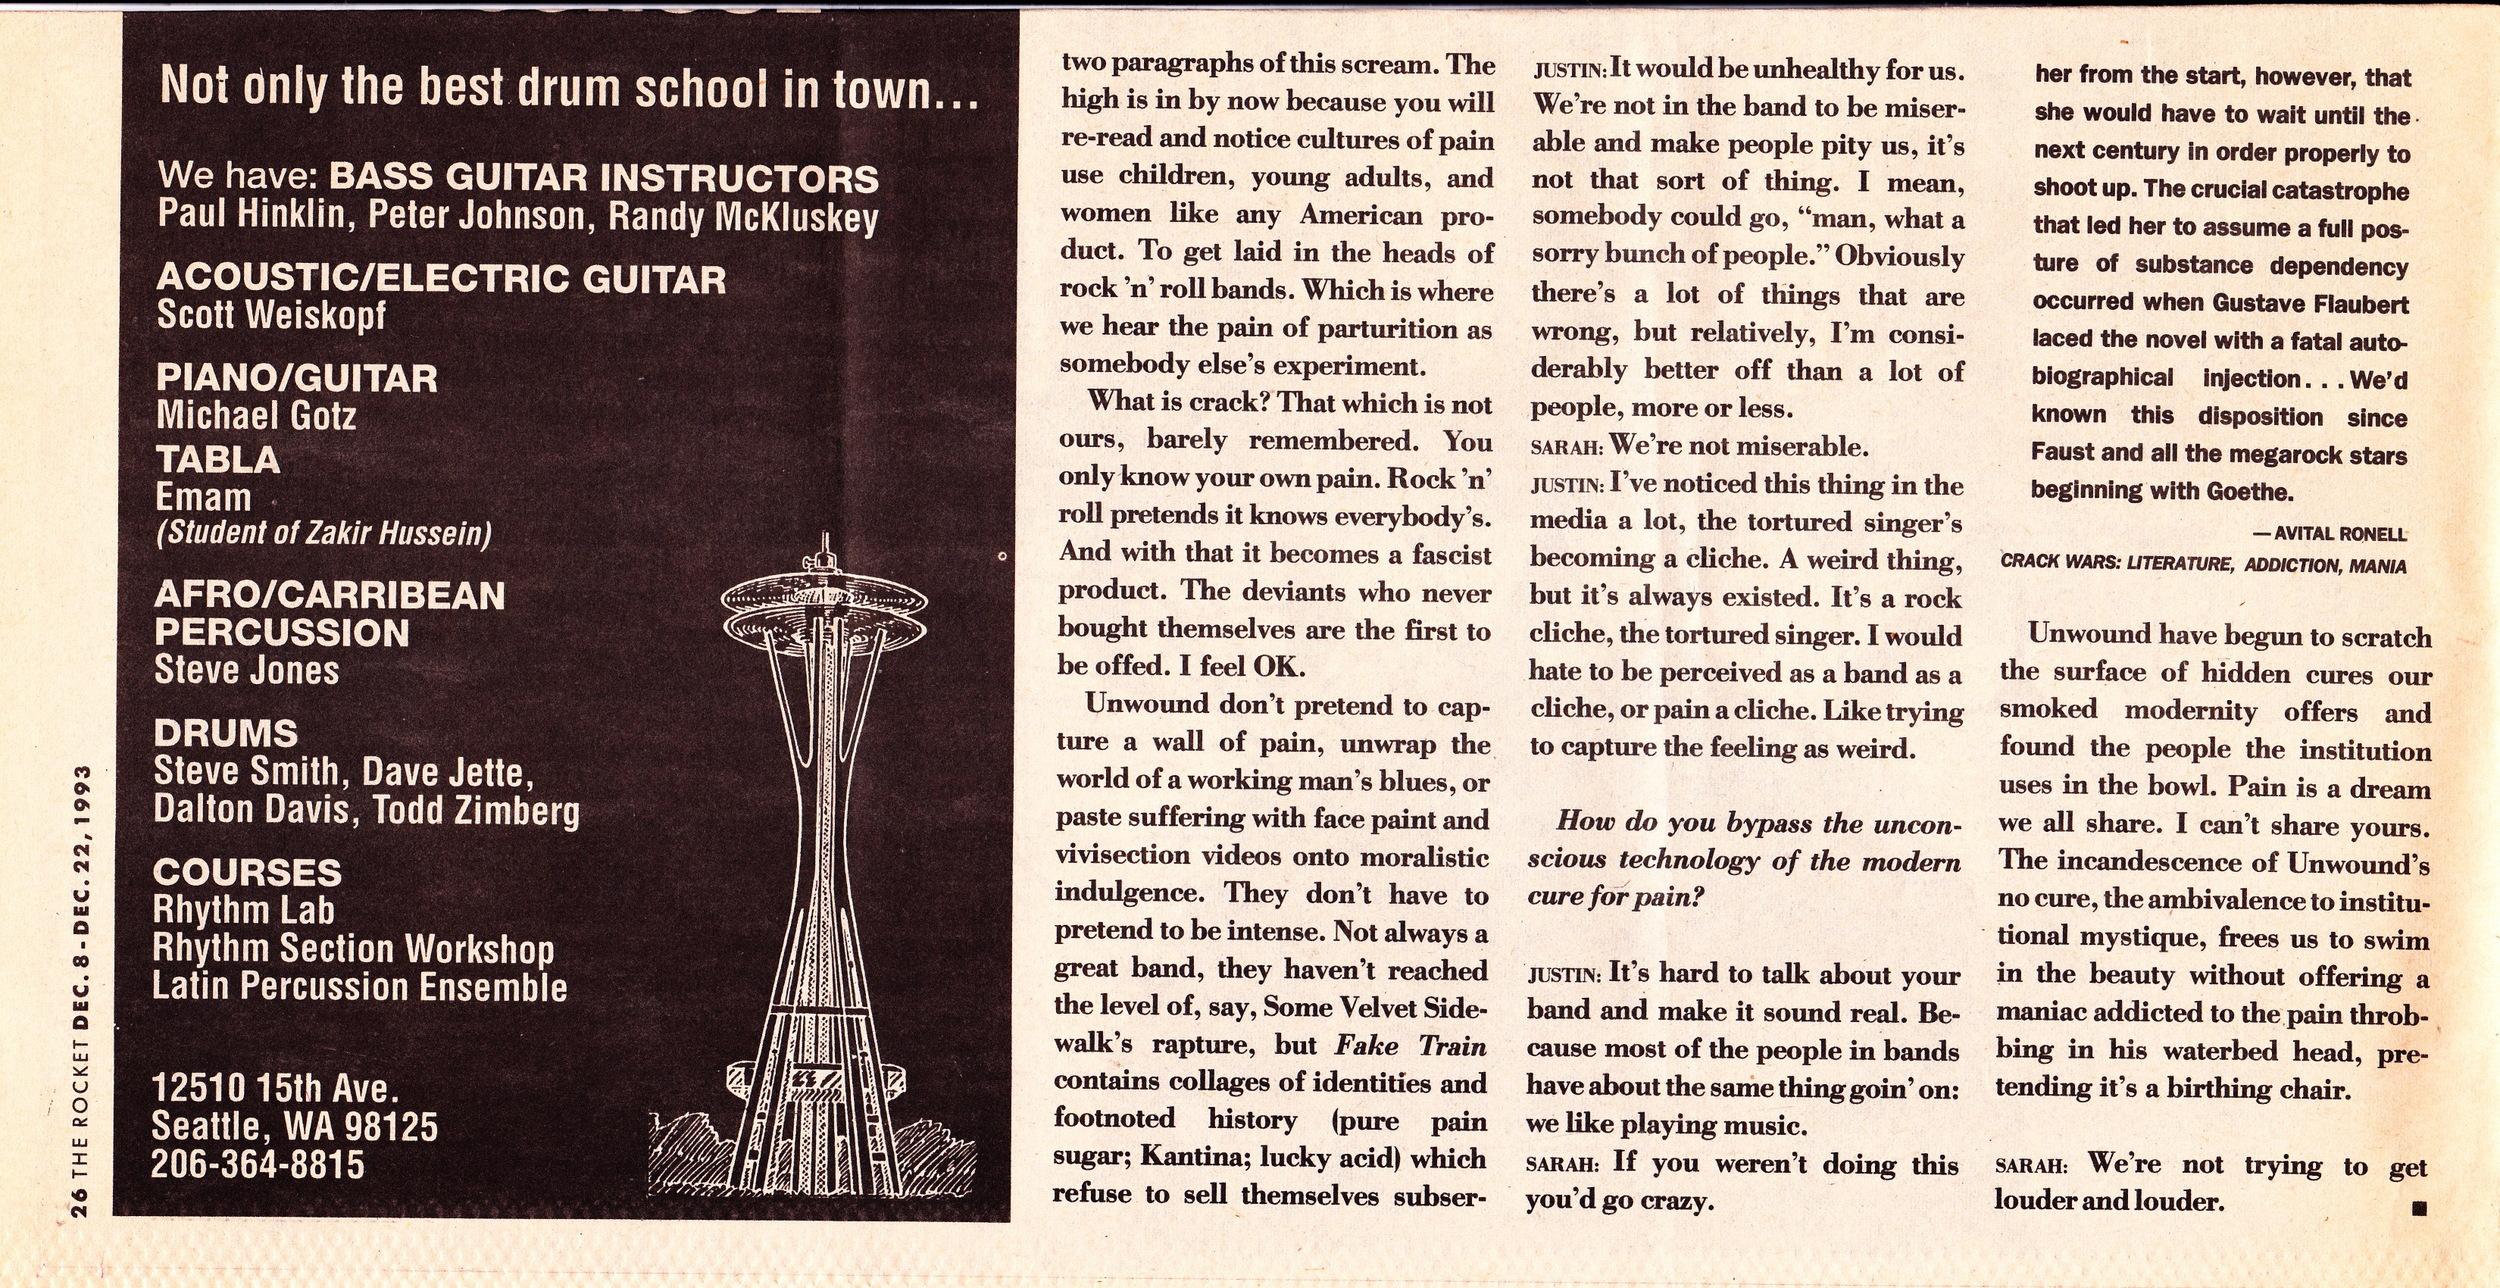 The Seattle Rocket Dec 1993 p.4 of 4